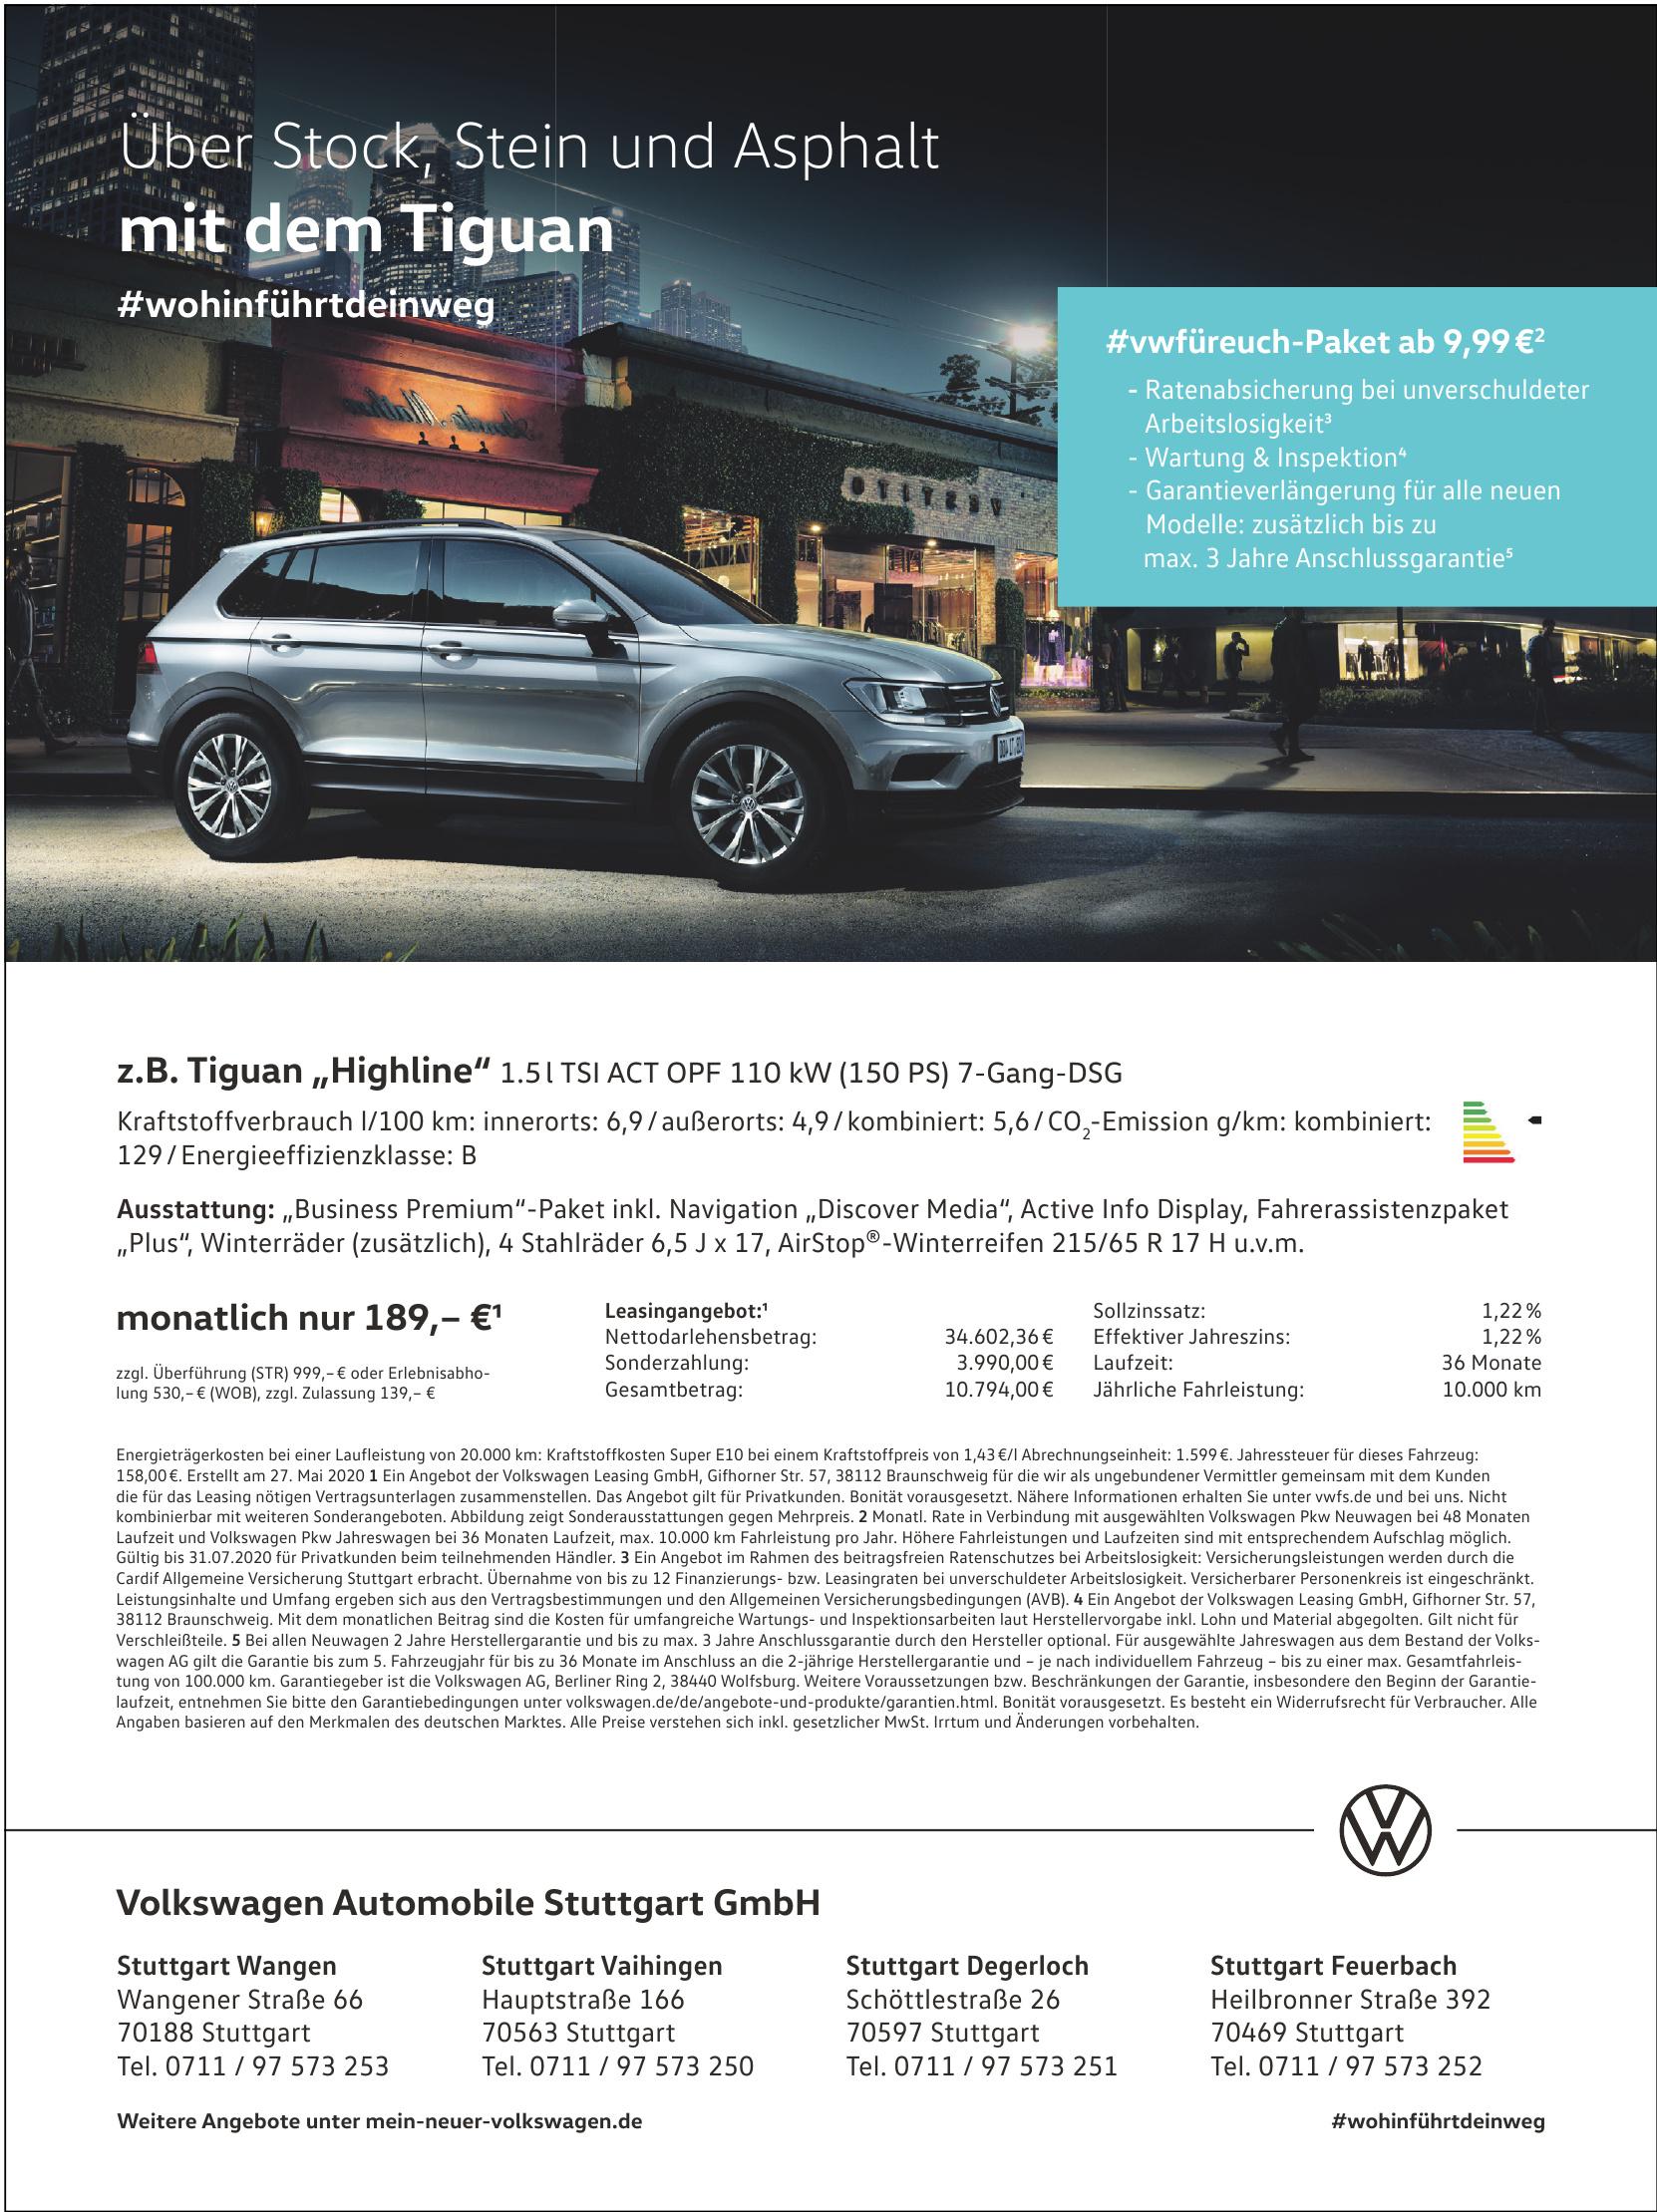 Volkswagen Automobile Stuttgart GmbH - Stuttgart Wangen